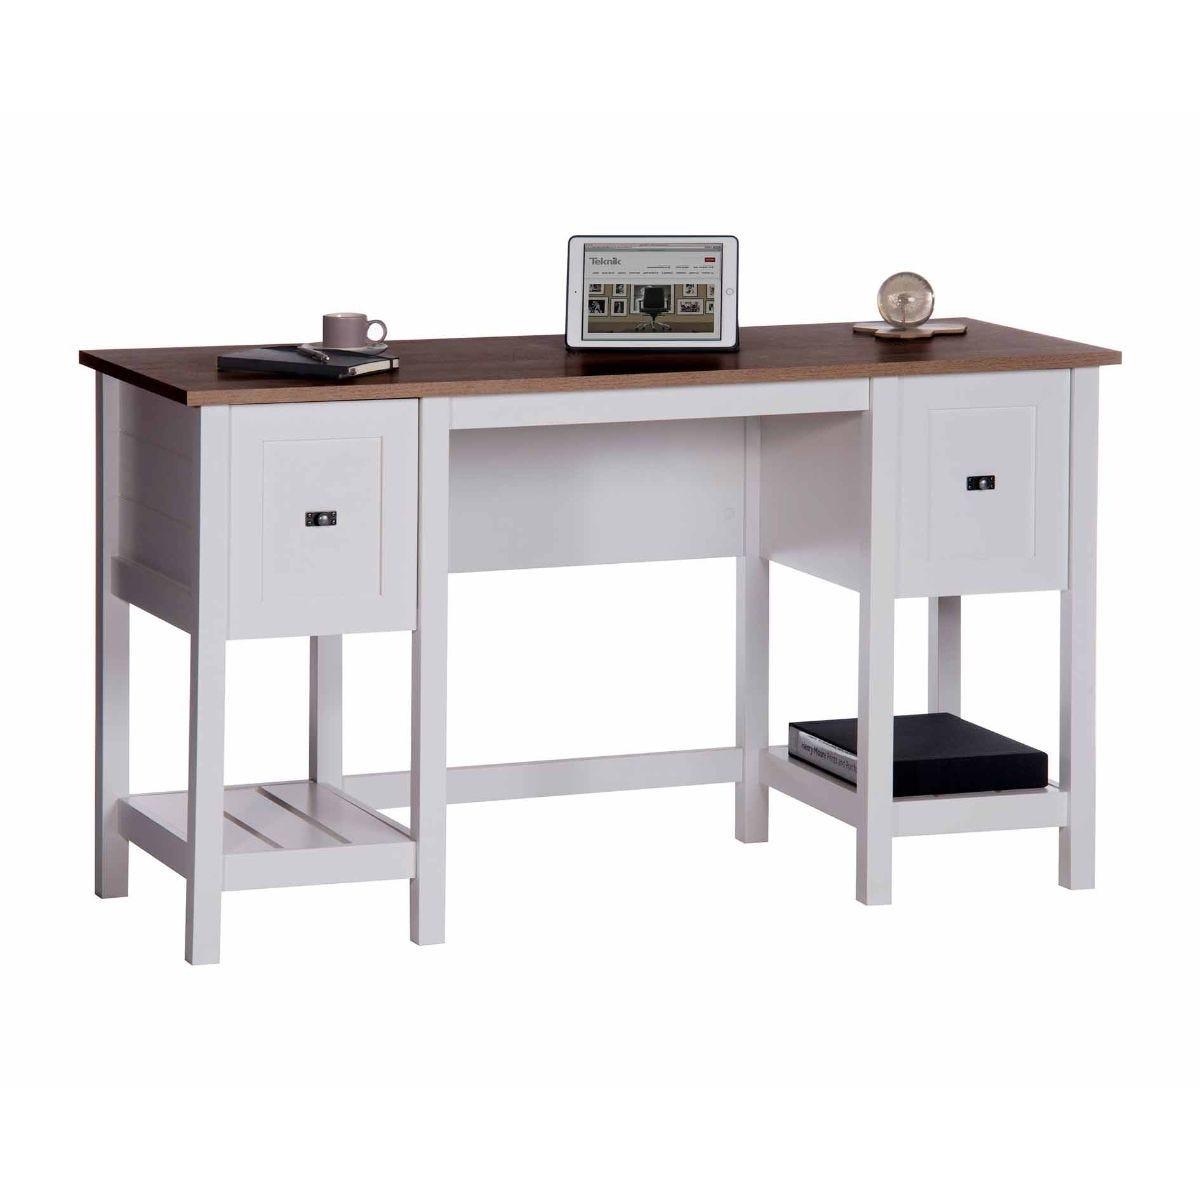 Home office desk desk for the home ryman